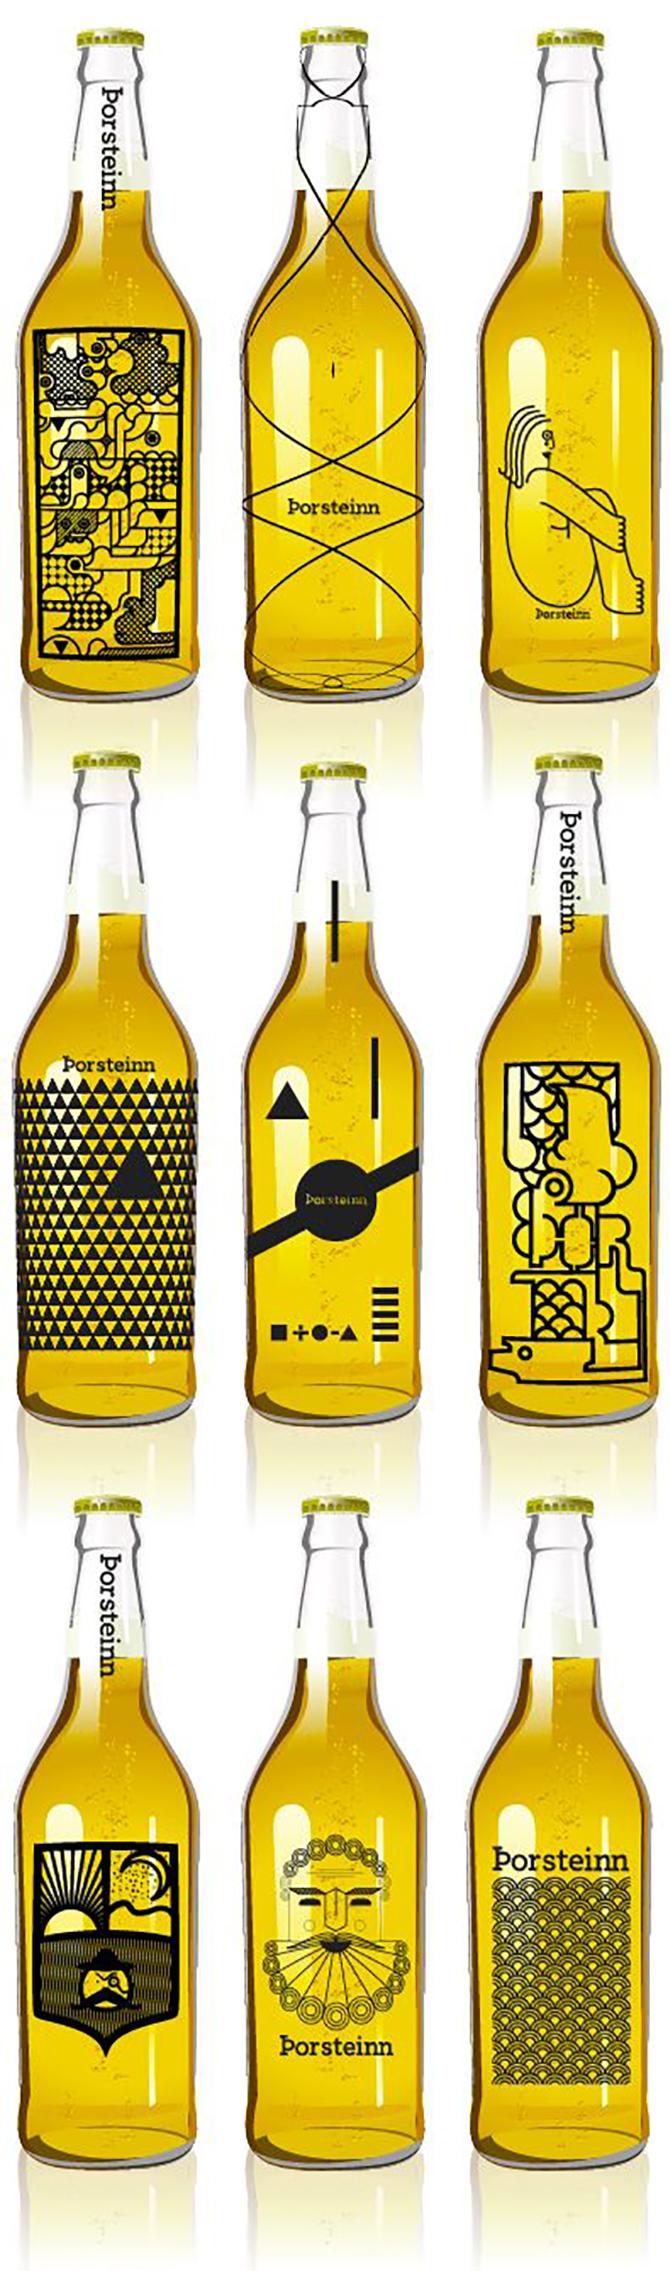 porsteinn-cervezas-diseño-johnappleman